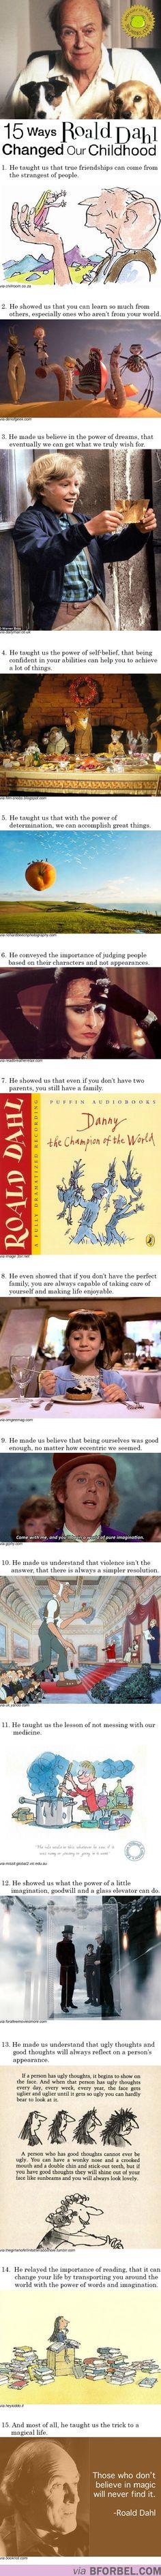 15 Ways Roald Dahl Changed Our Childhood… Happy Roald Dahl Day!